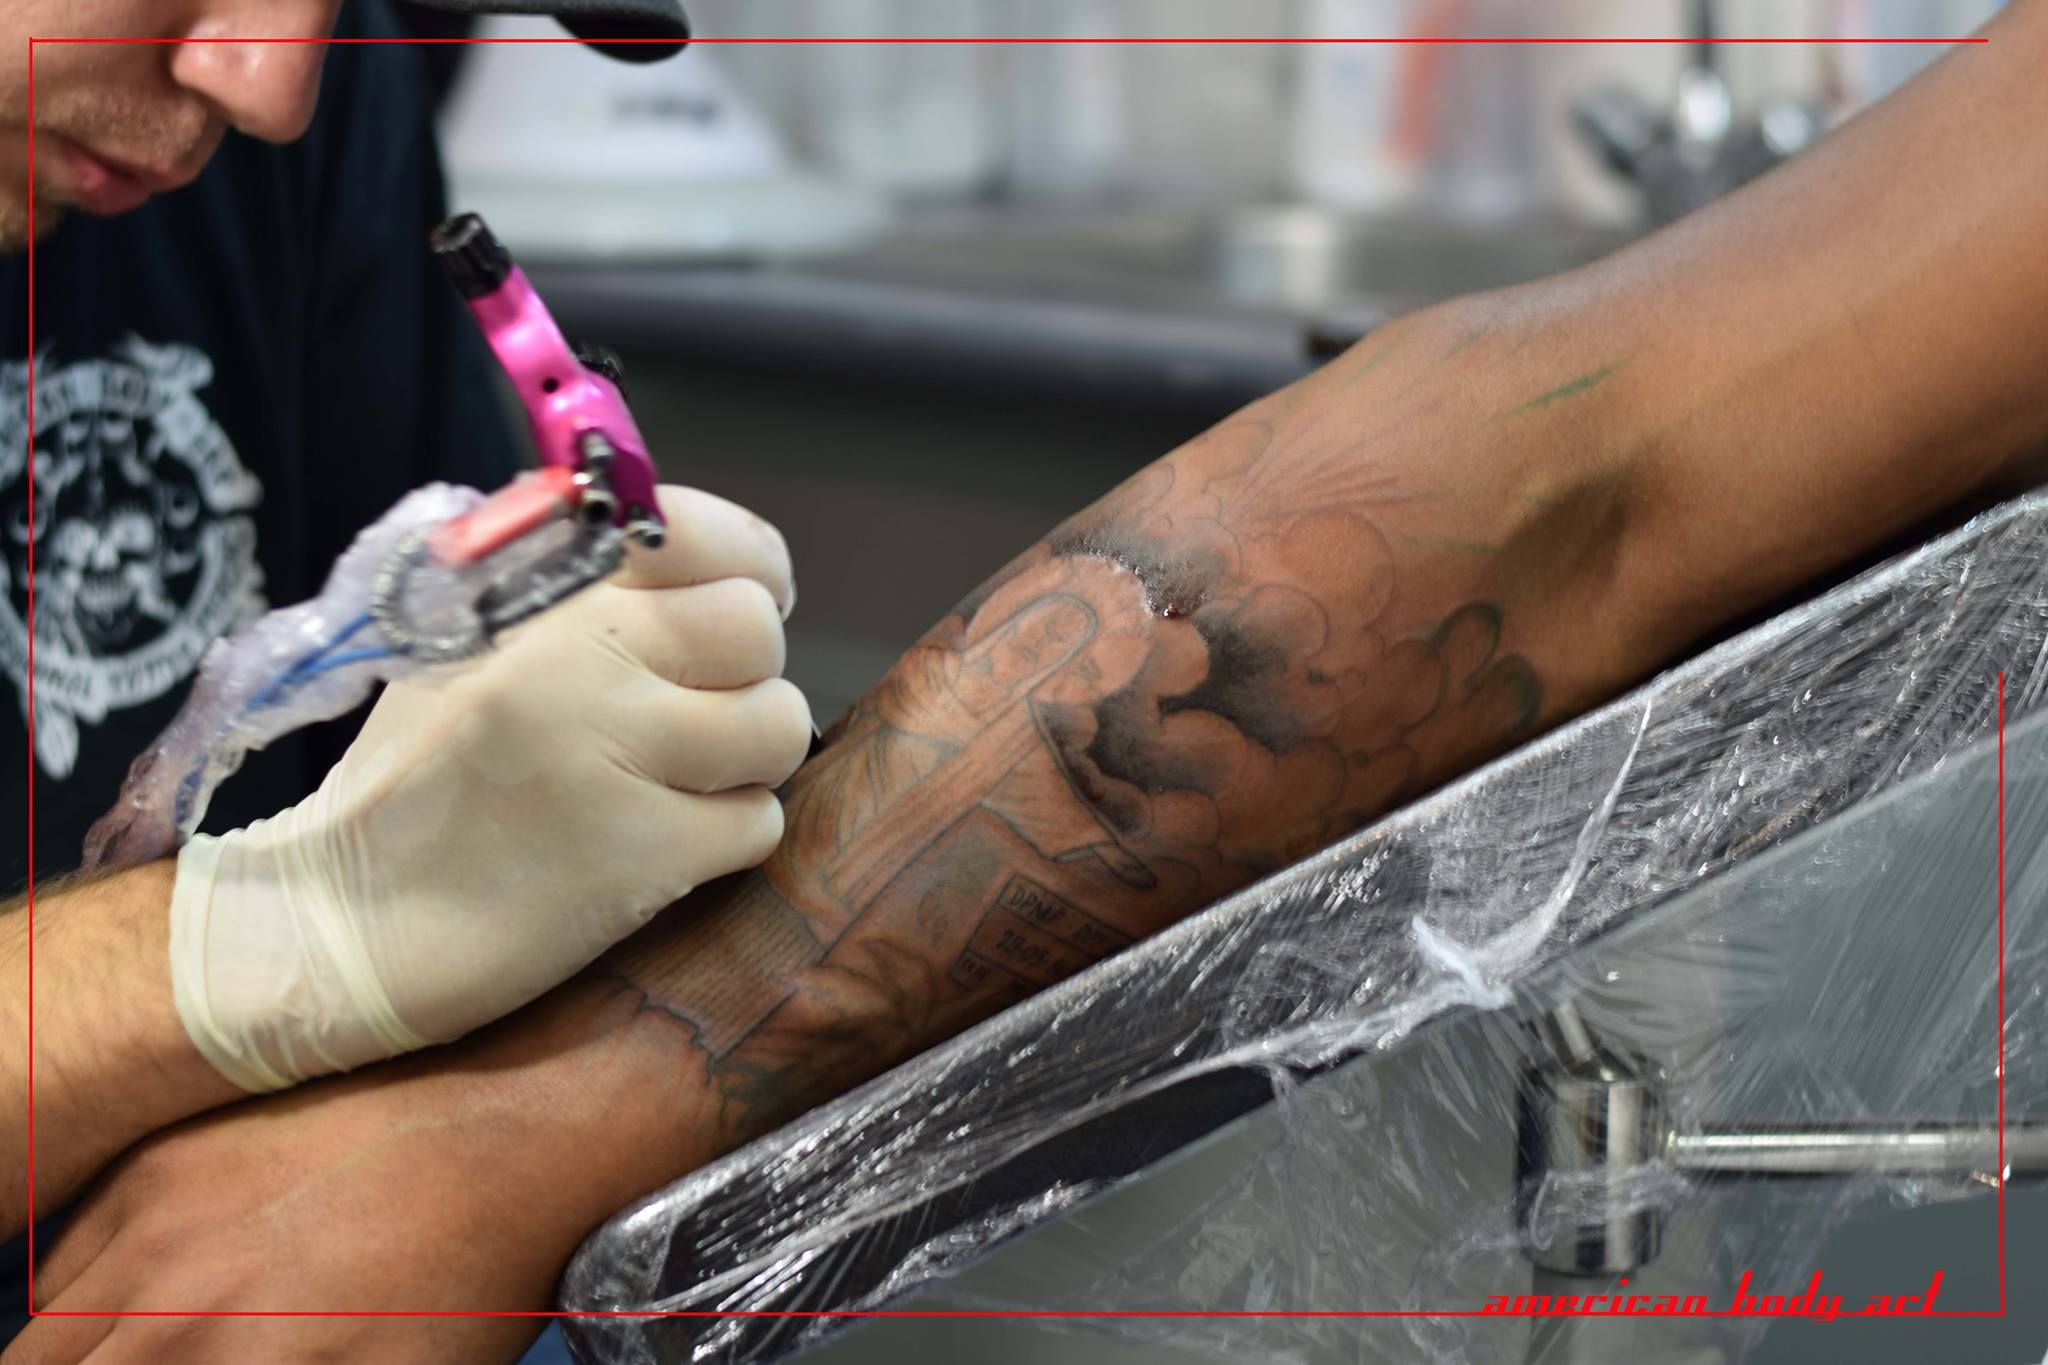 Tatouage Paris - American Body Art